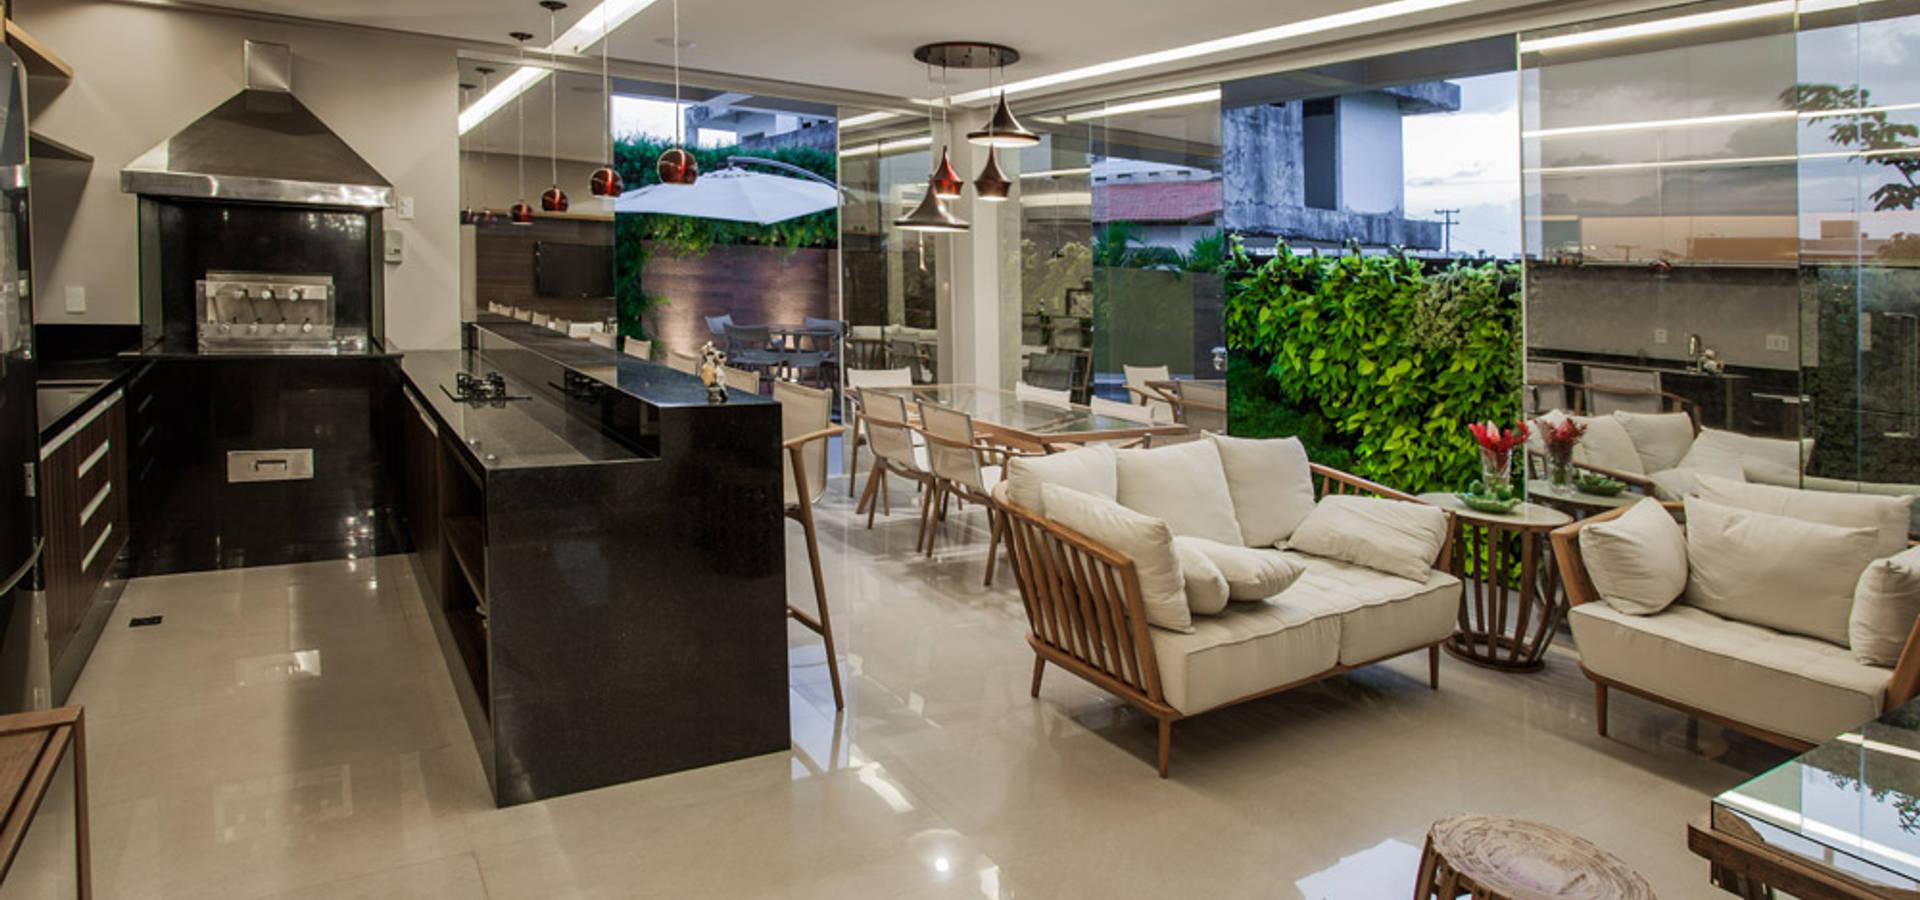 Top Varanda gourmet e Piscina por Heloisa Titan Arquitetura | homify QP73